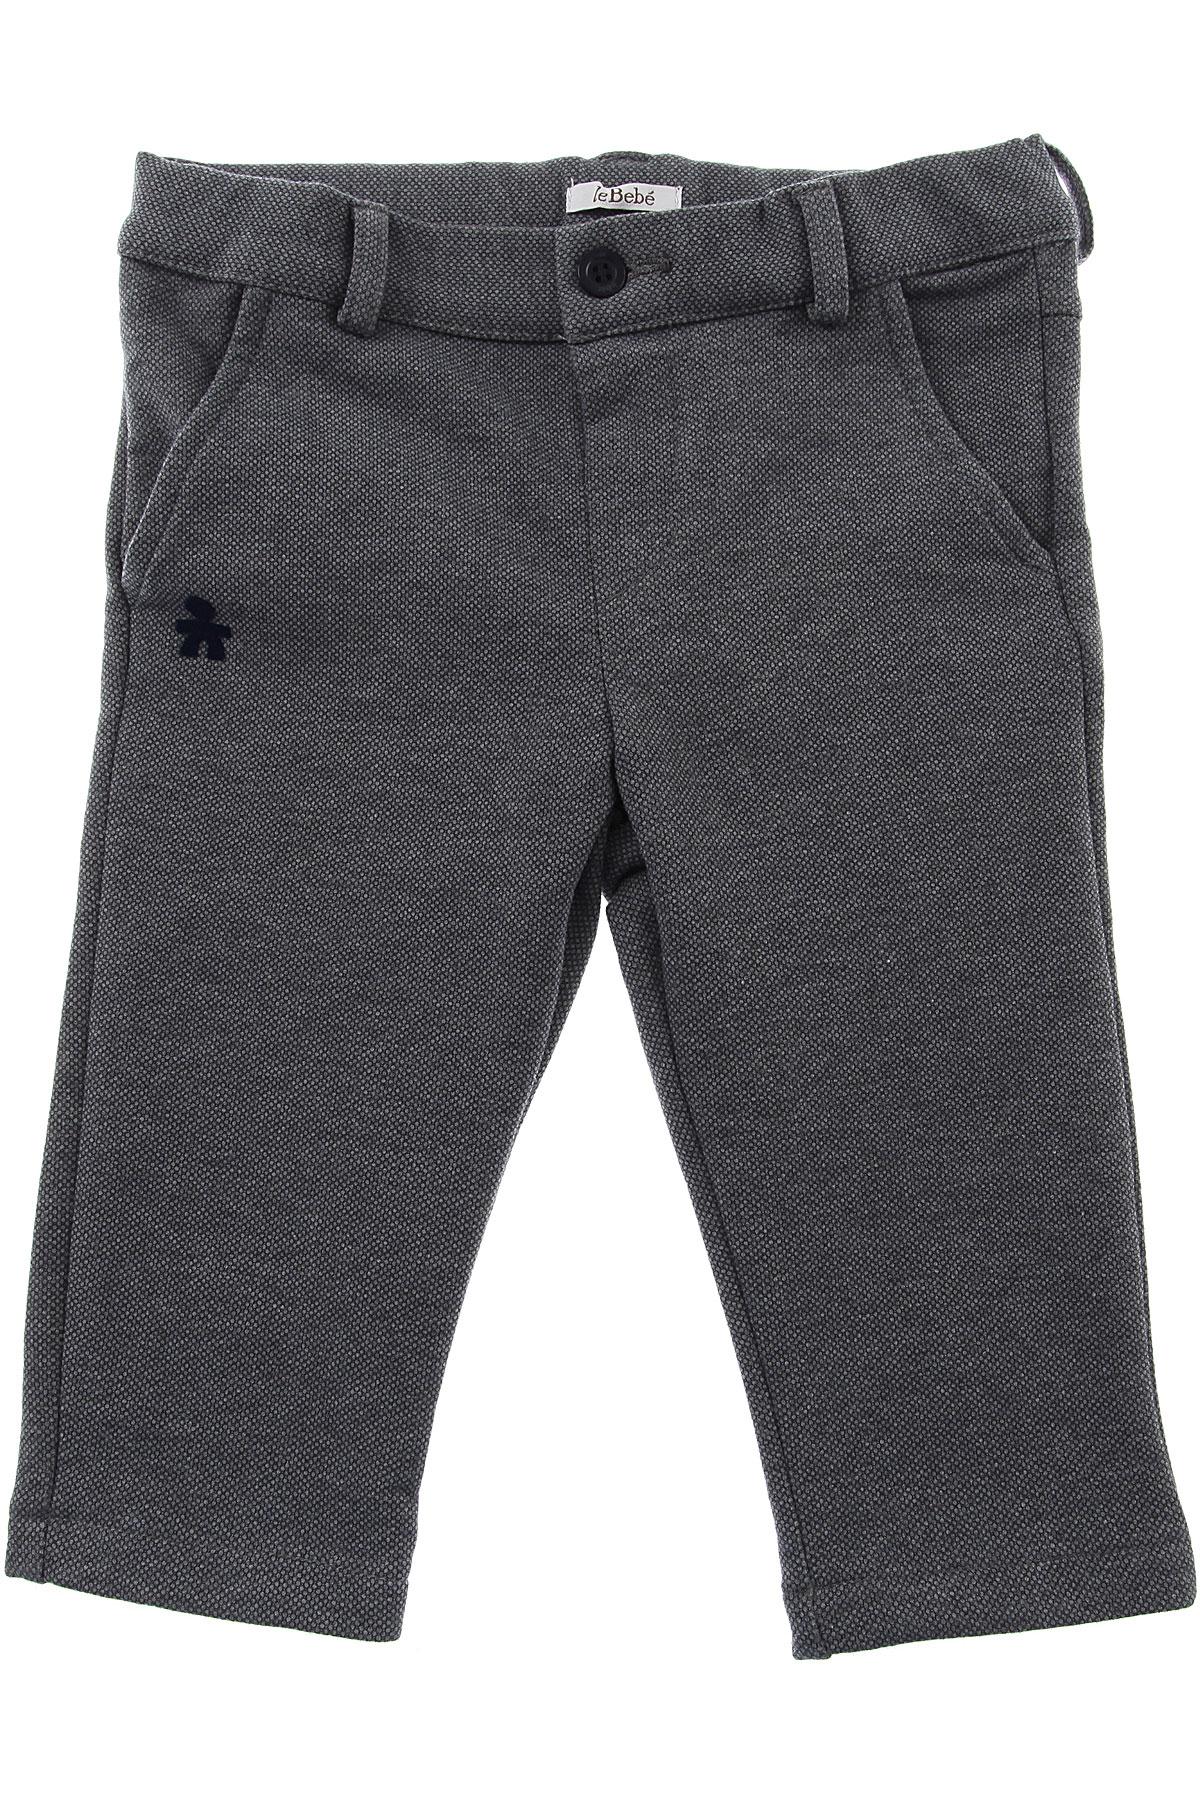 Image of Le Bebe Baby Pants for Boys, Grey, Cotton, 2017, 12M 18M 6M 9M